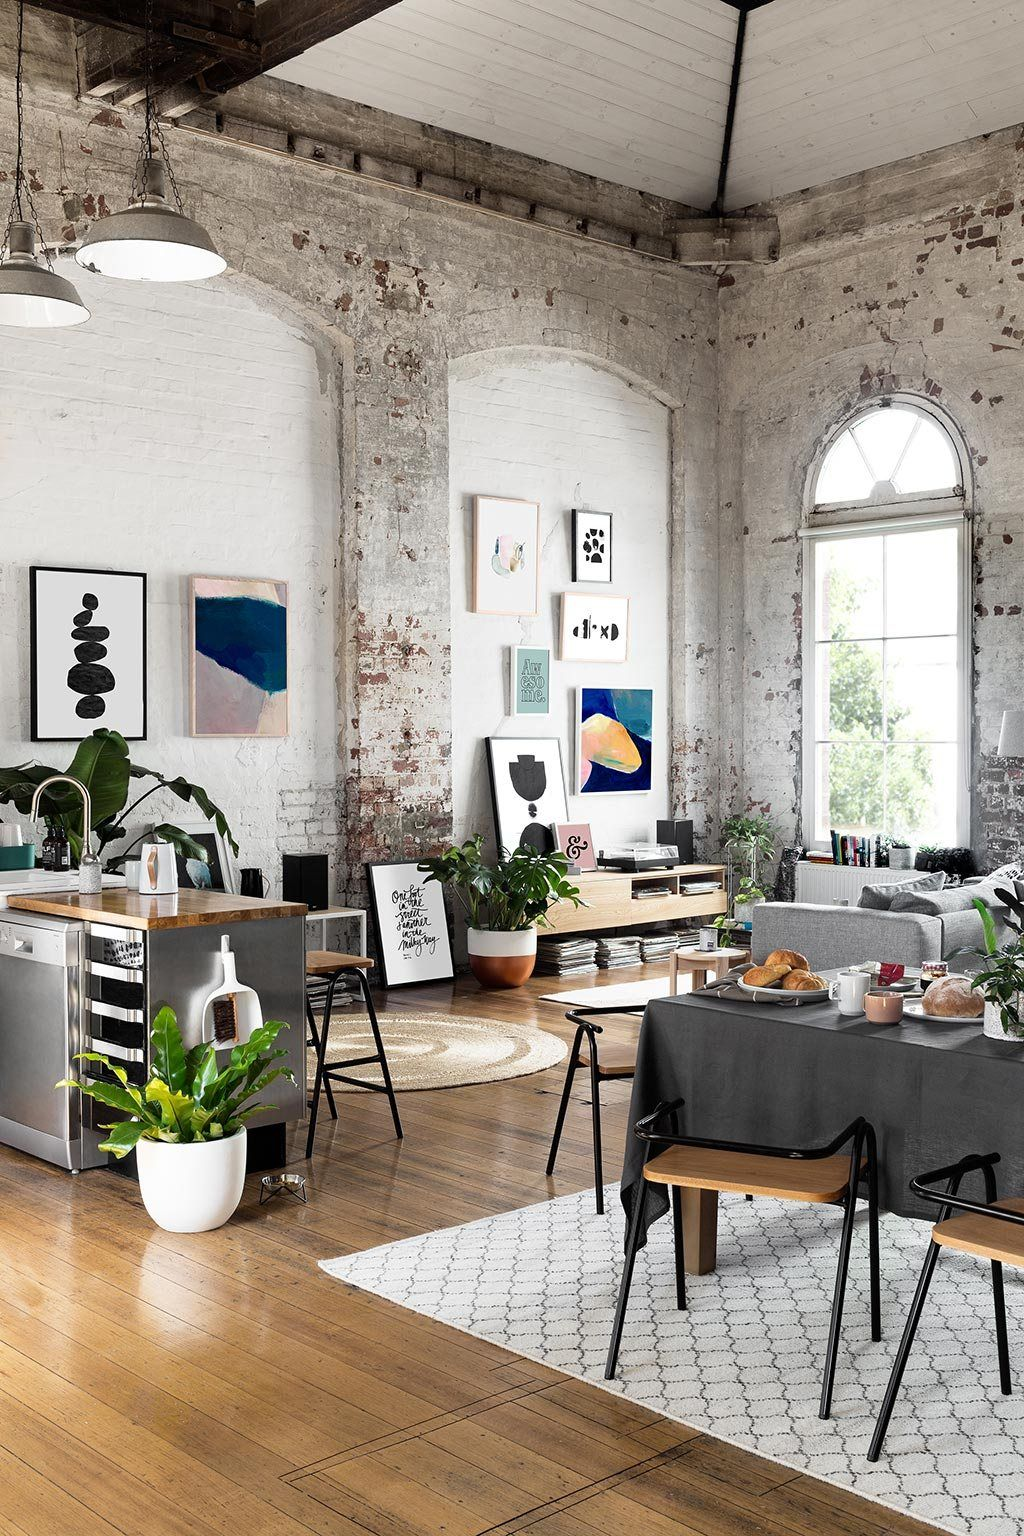 Un magnifique loft australien | Pinterest | Innenarchitektur, Küchen ...